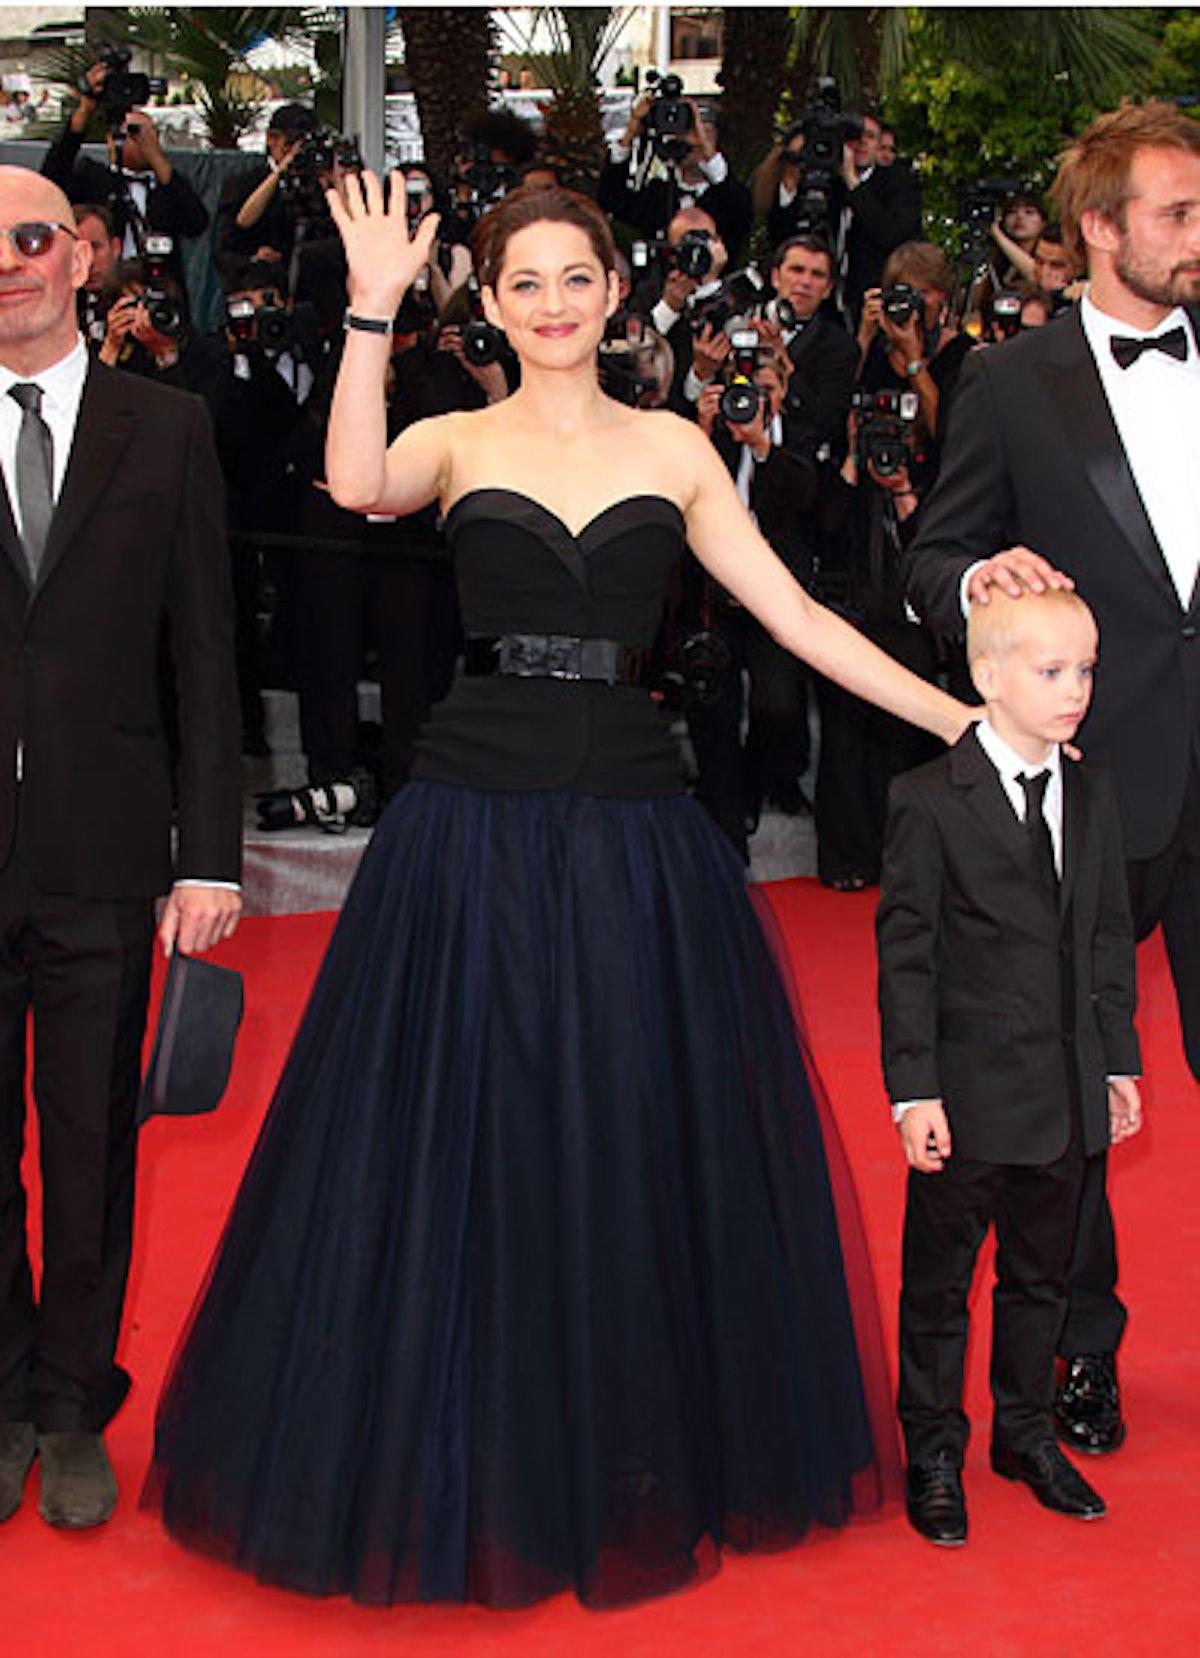 cess-marion-cotillard-best-red-carpet-looks-04-v.jpg